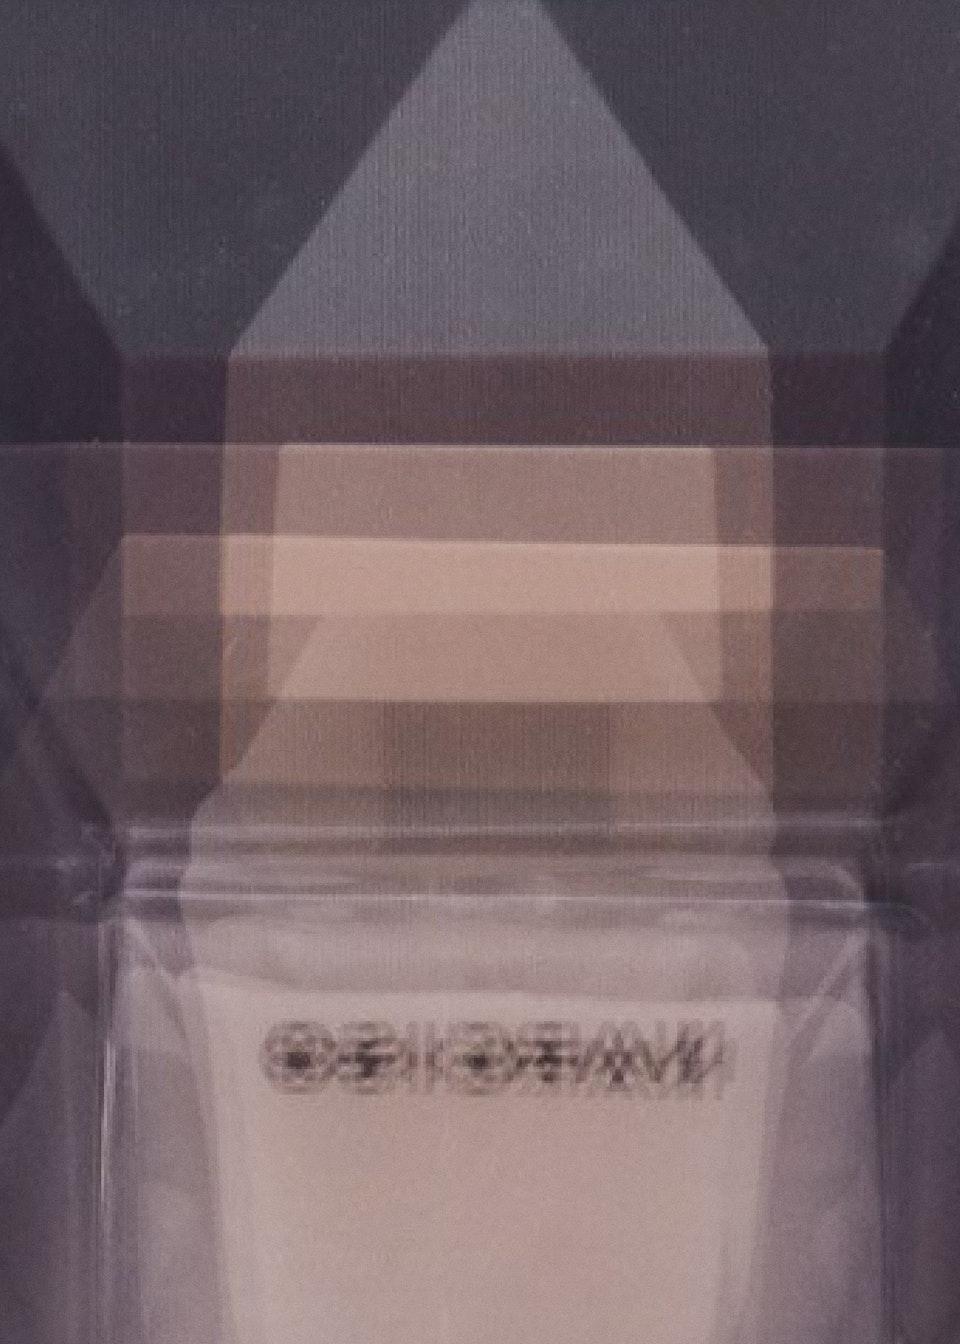 Narciso Rodriguez Perfume - Stills BLOOM_NARCISO_PARFUM_4